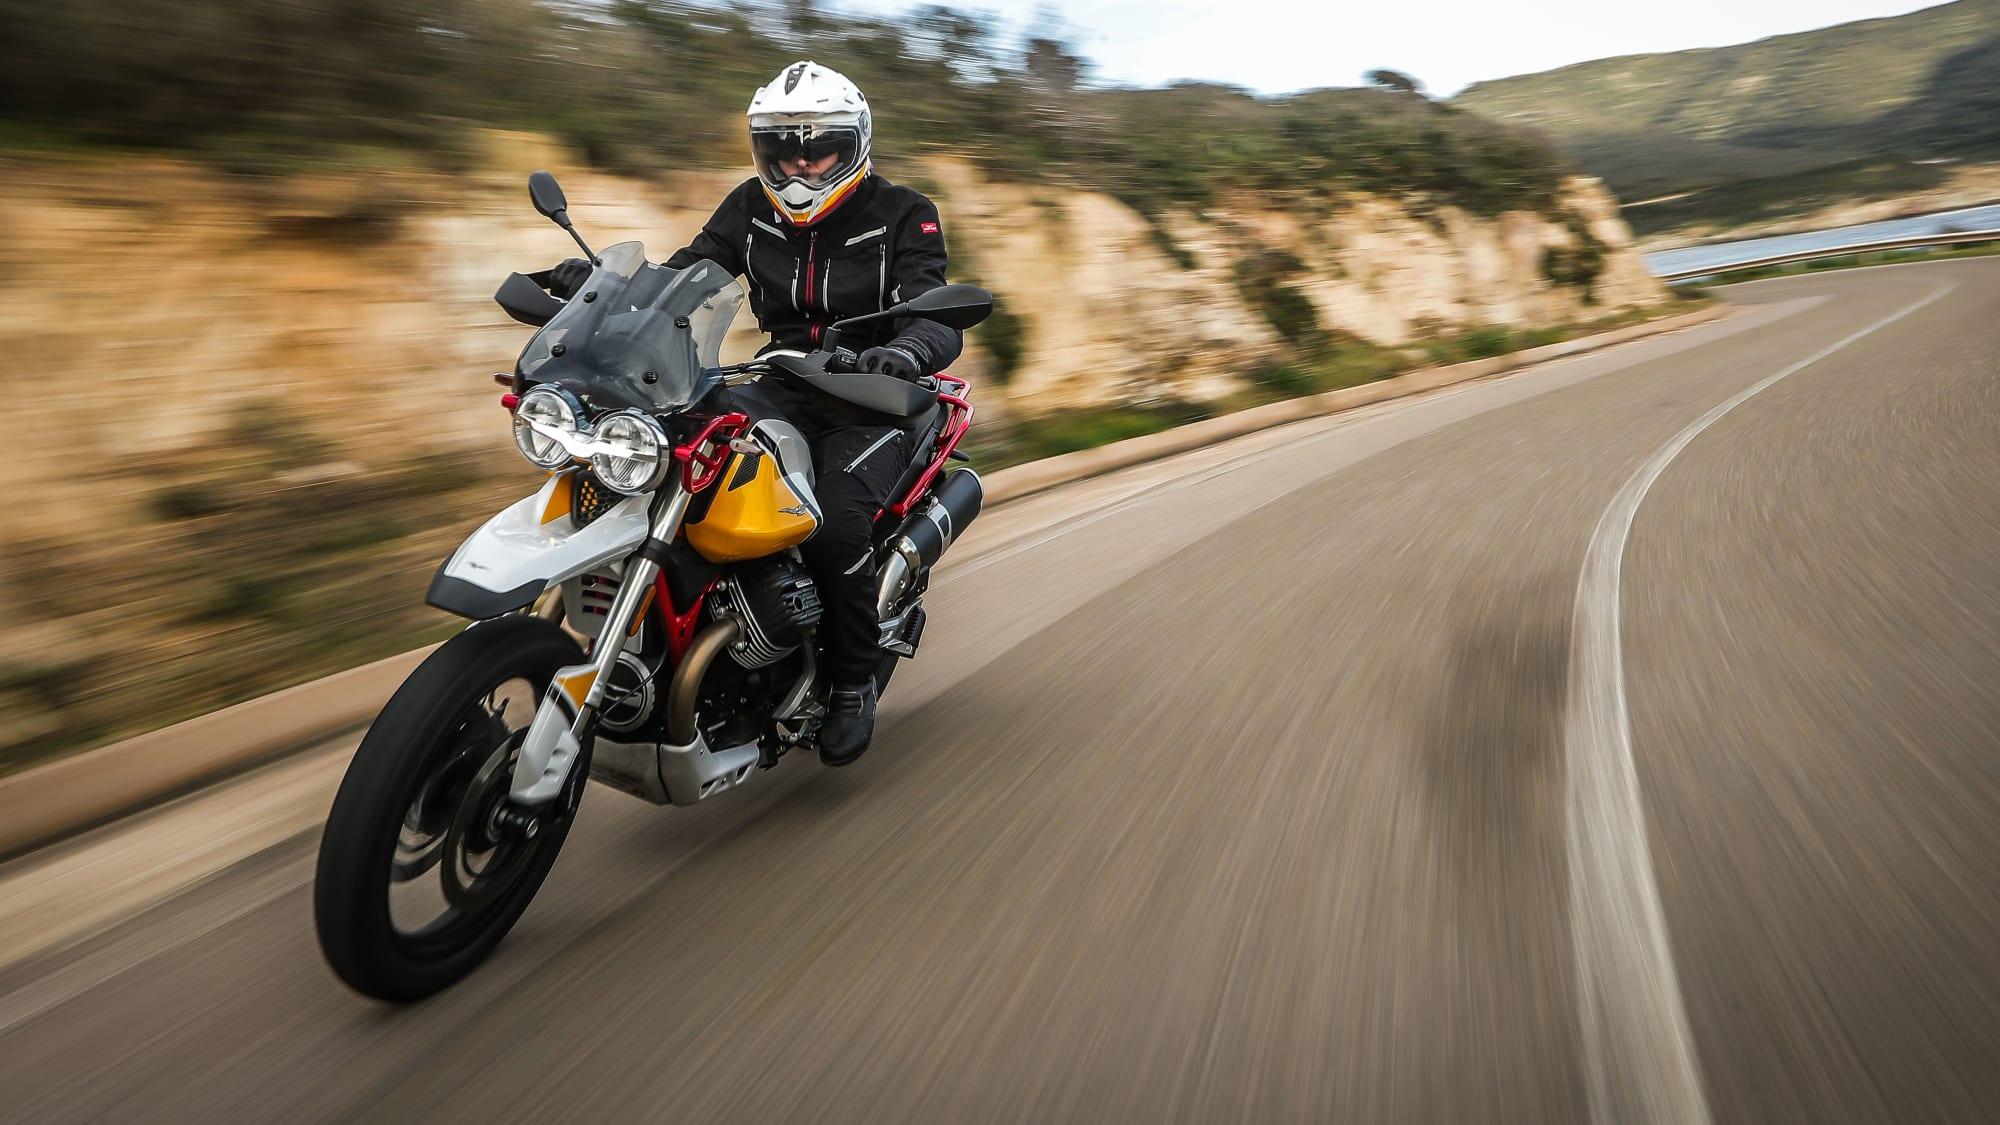 Moto Guzzi V85 TT fahrend in der Kurve